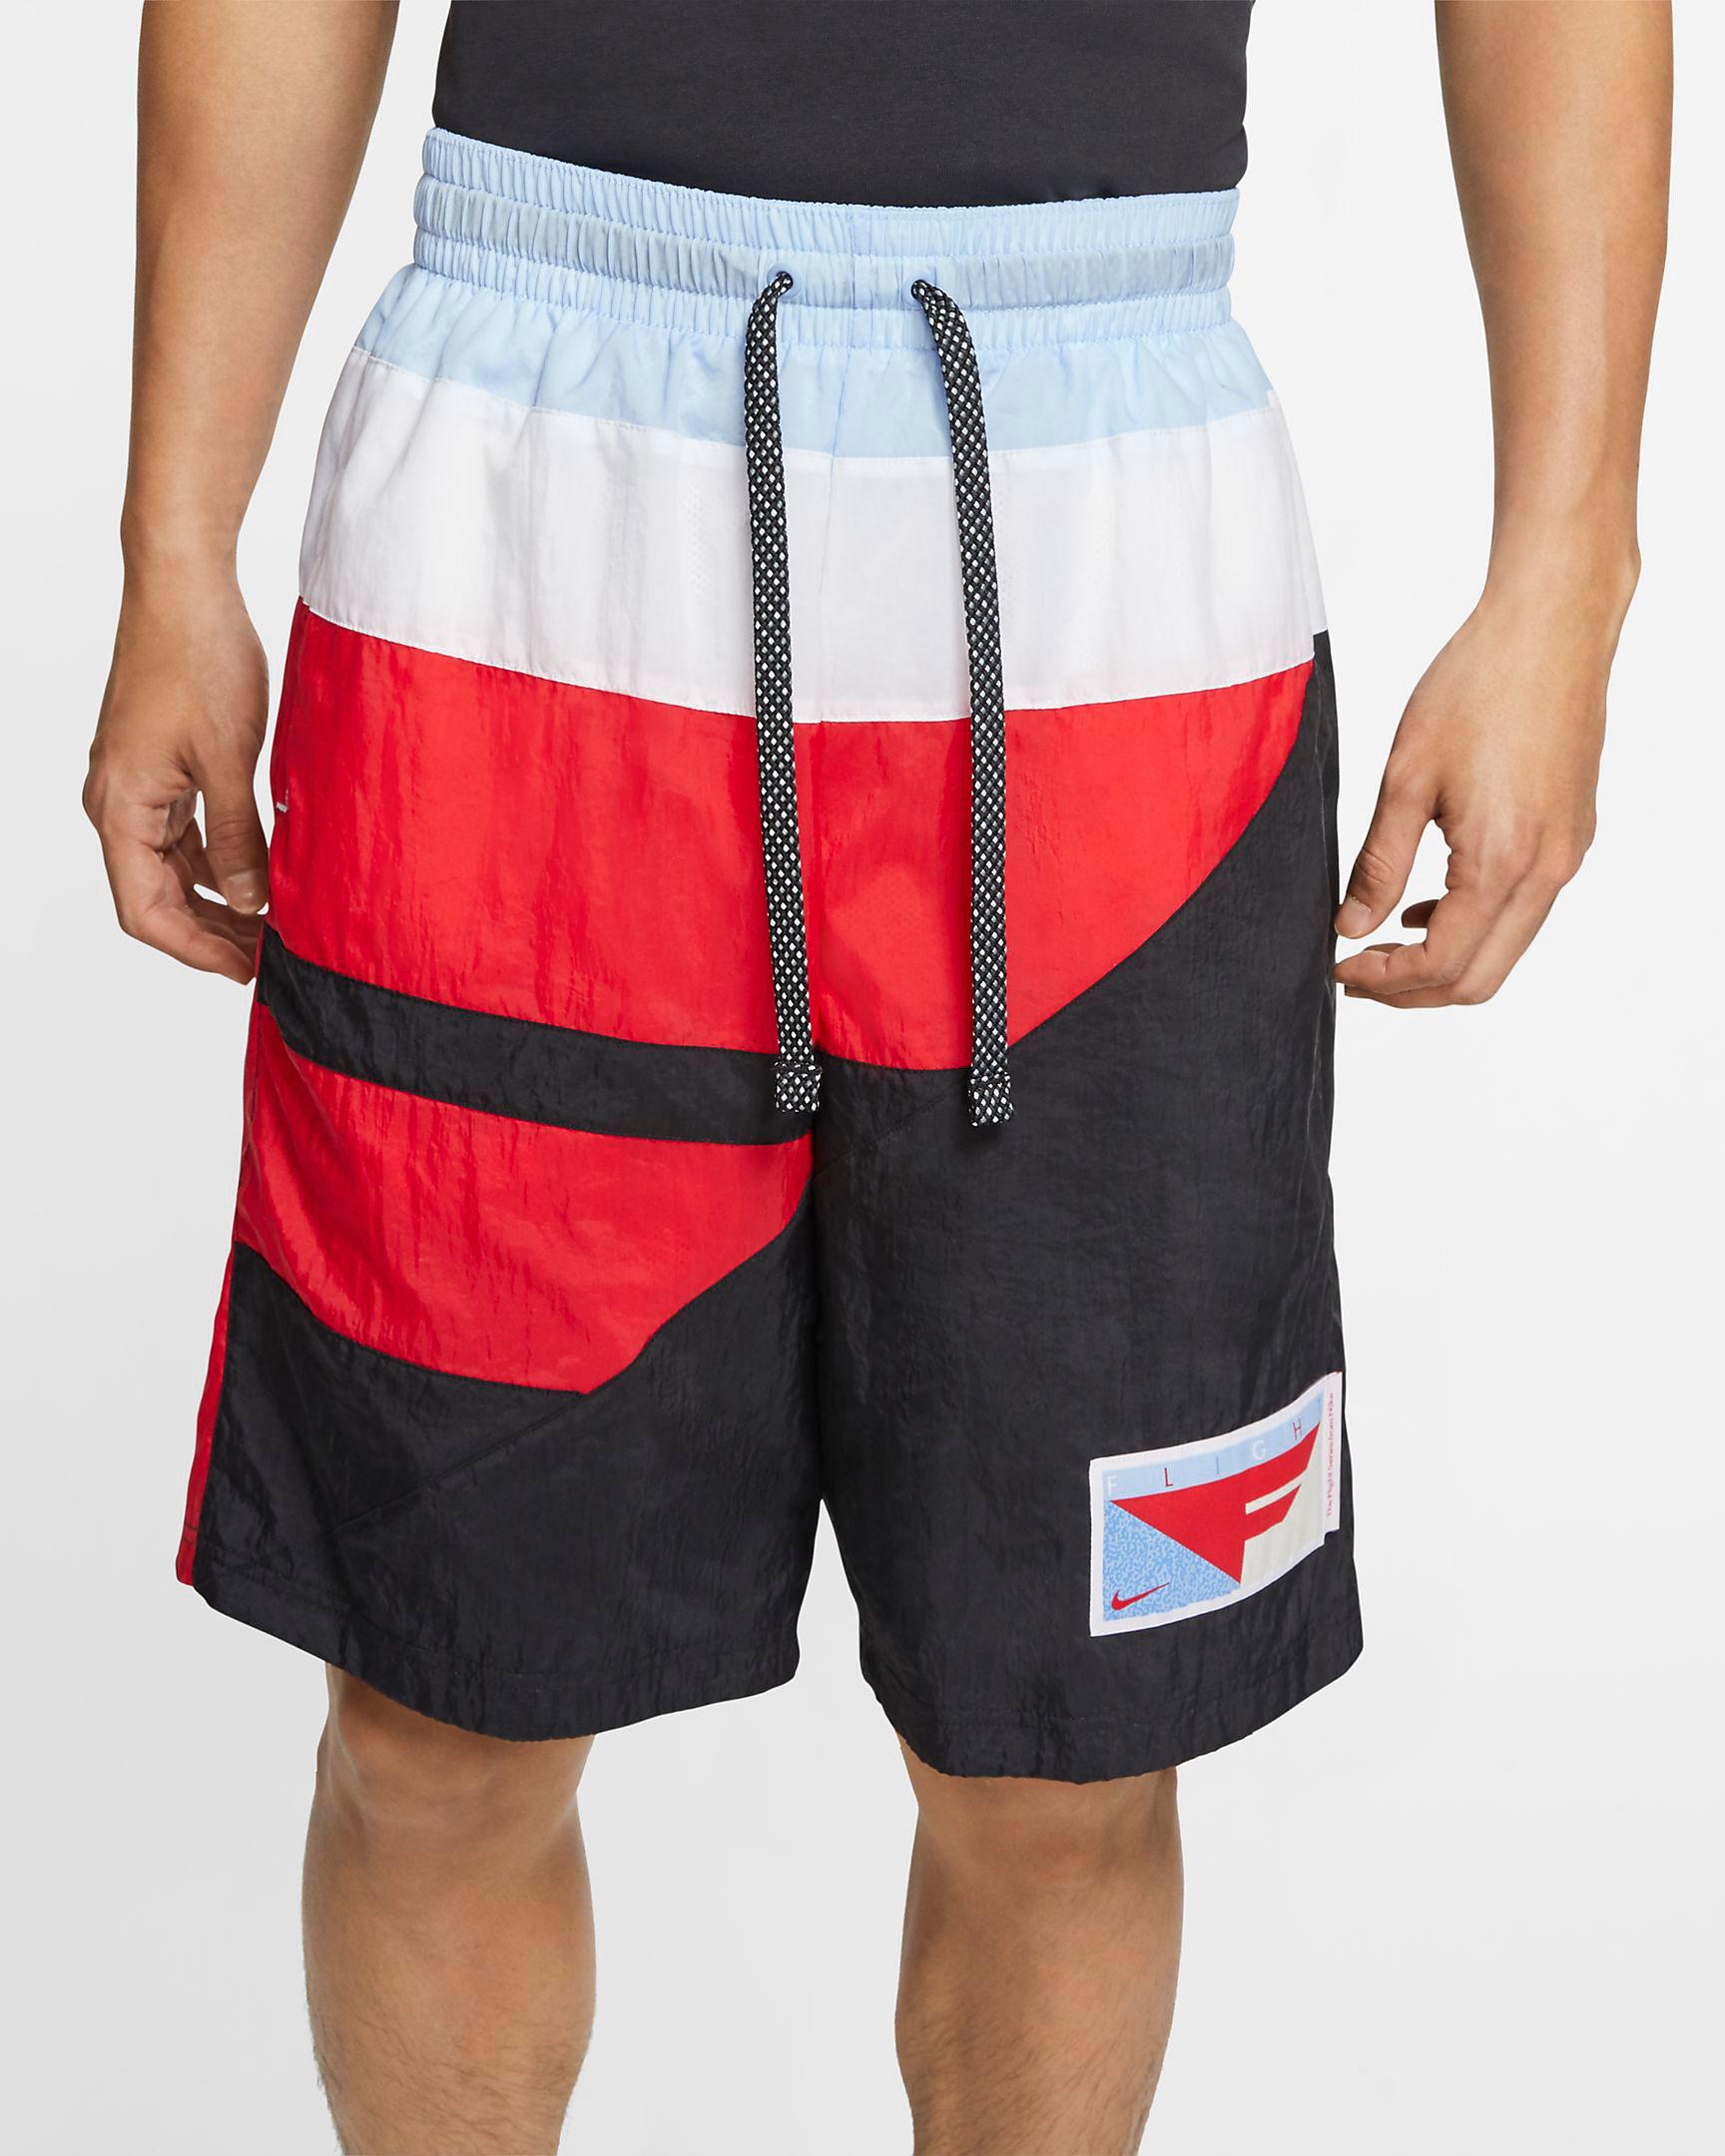 nike-flight-chicago-shorts-1